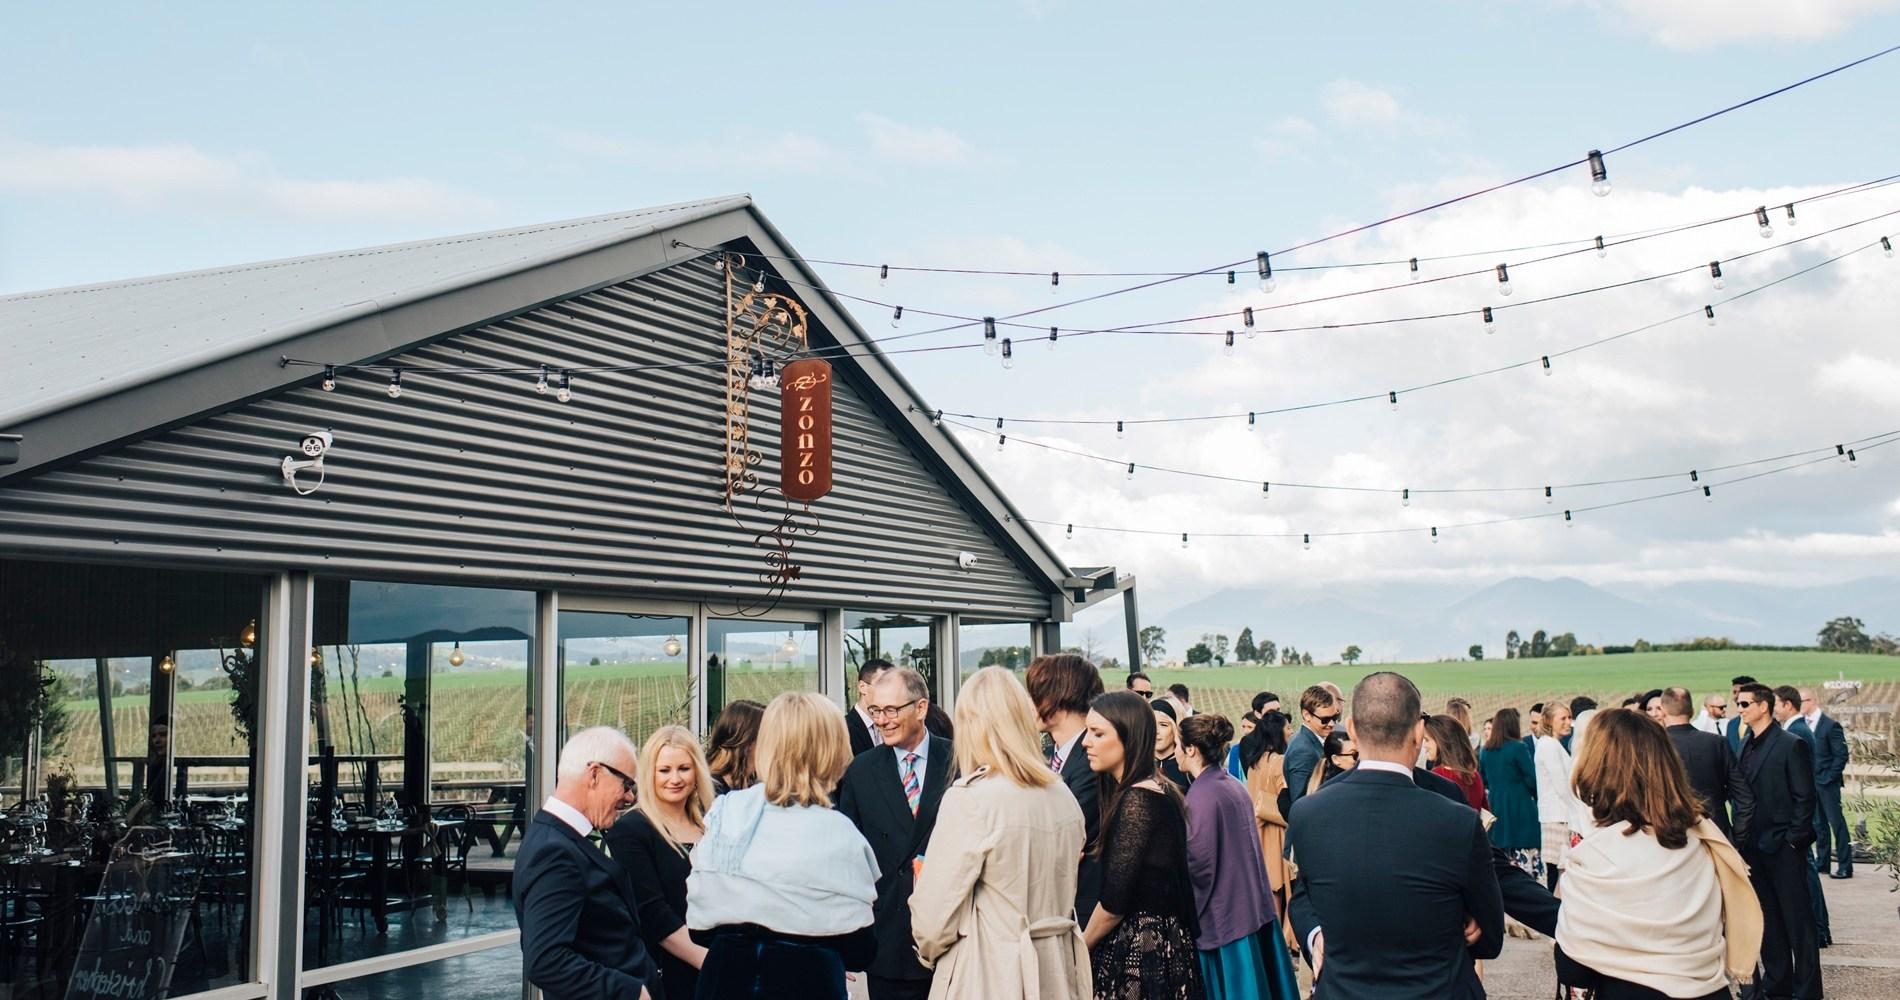 Stylish Barn Wedding by The White Tree Photography 29